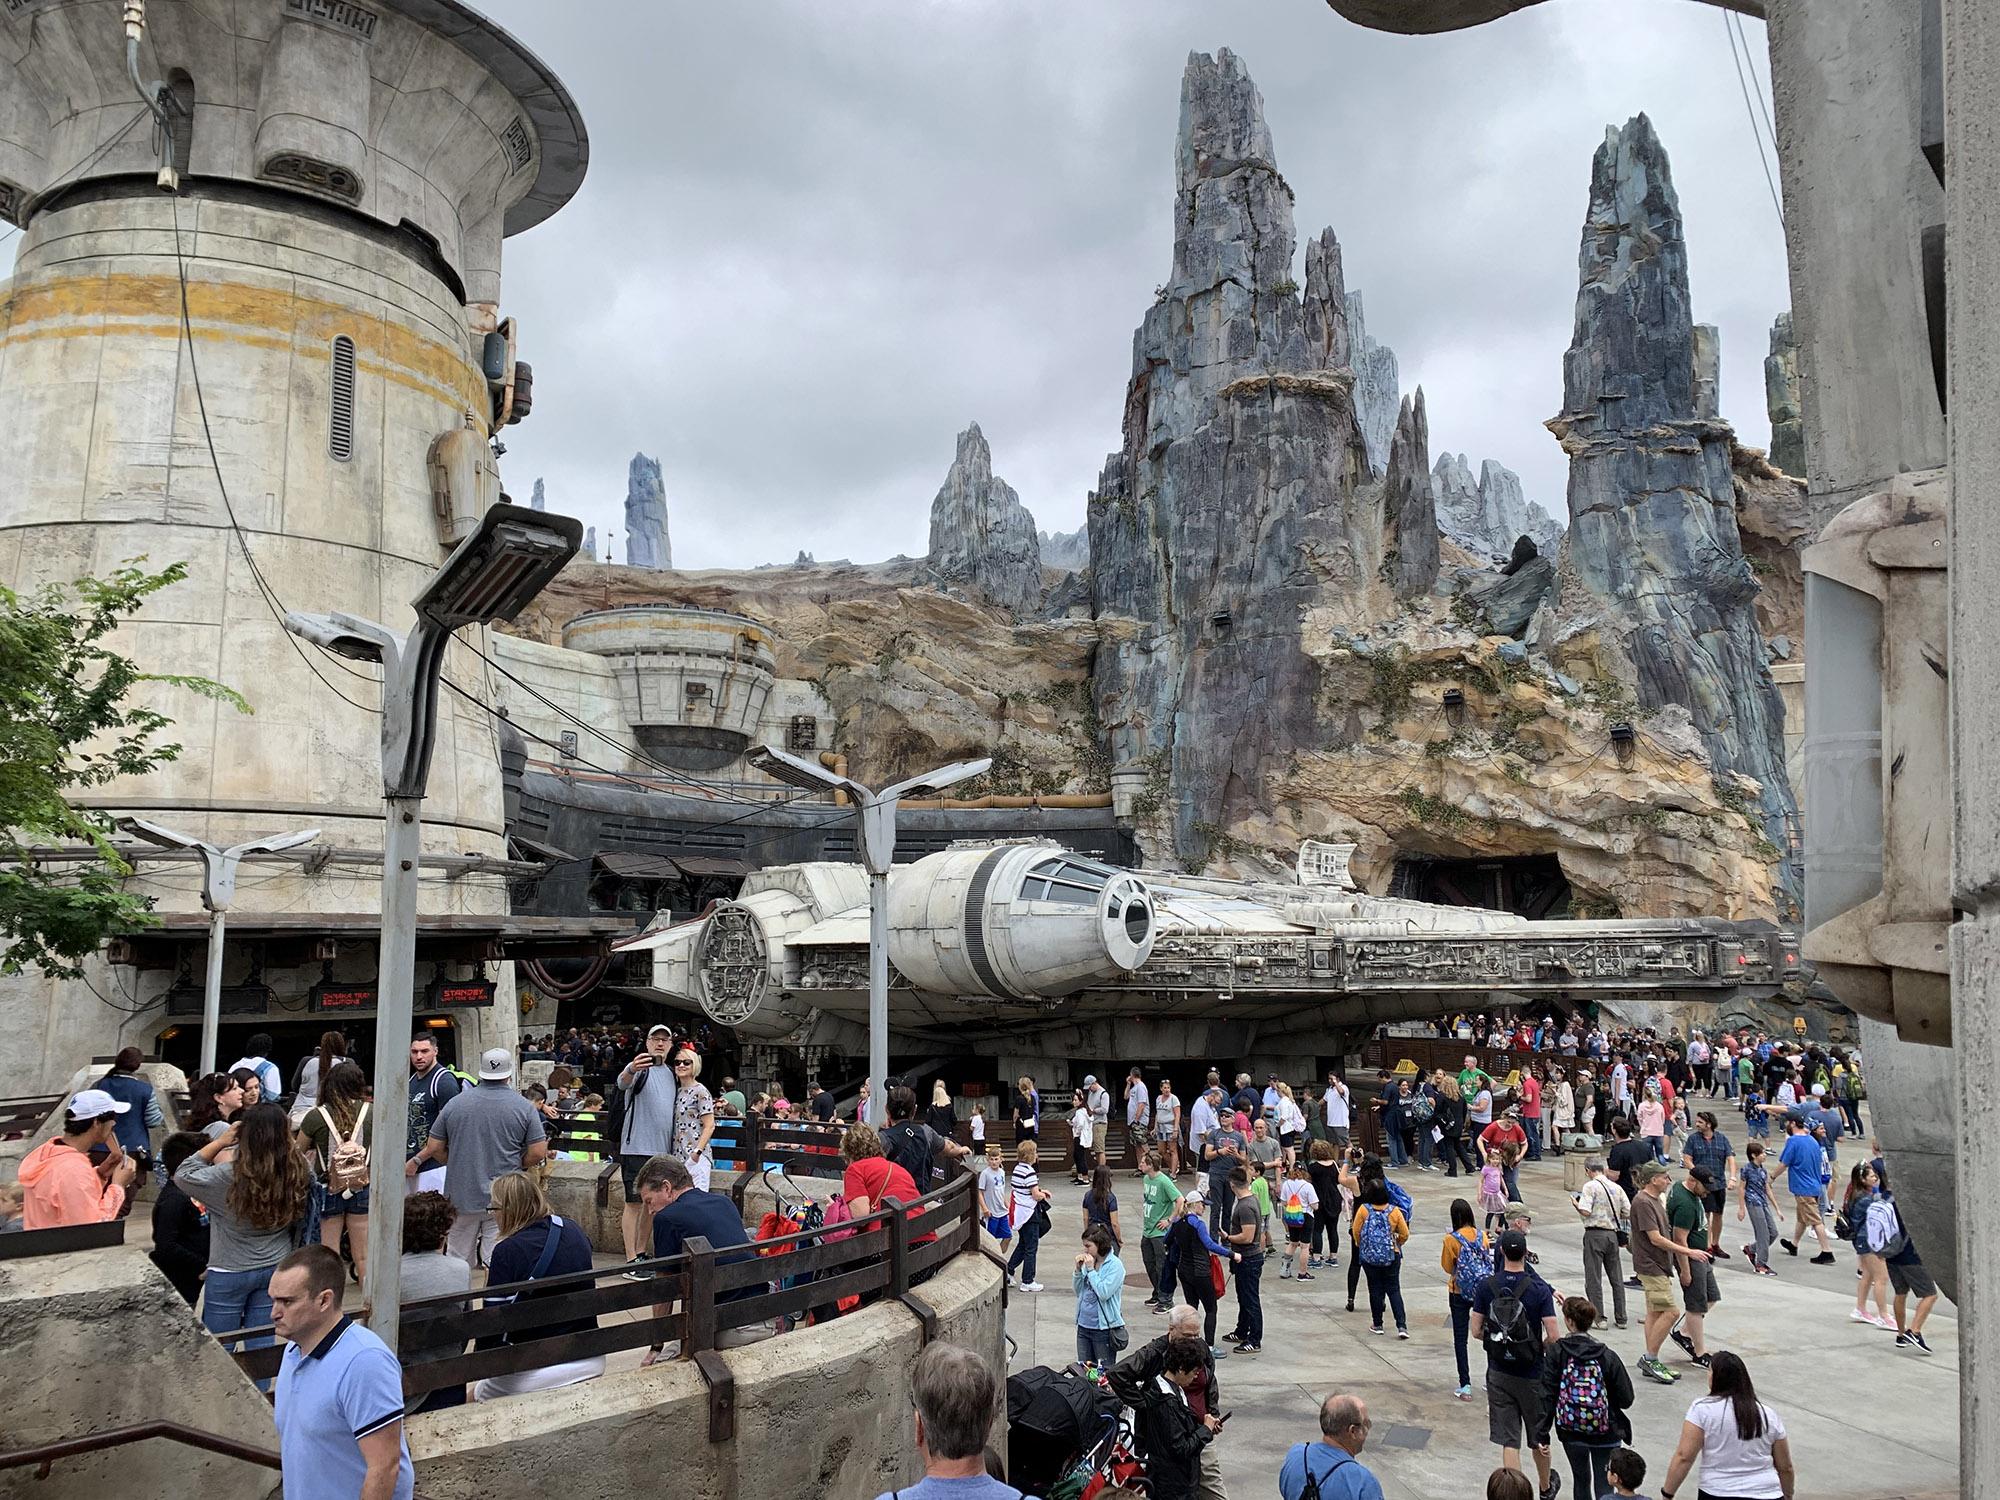 Disney World Star Wars hotel